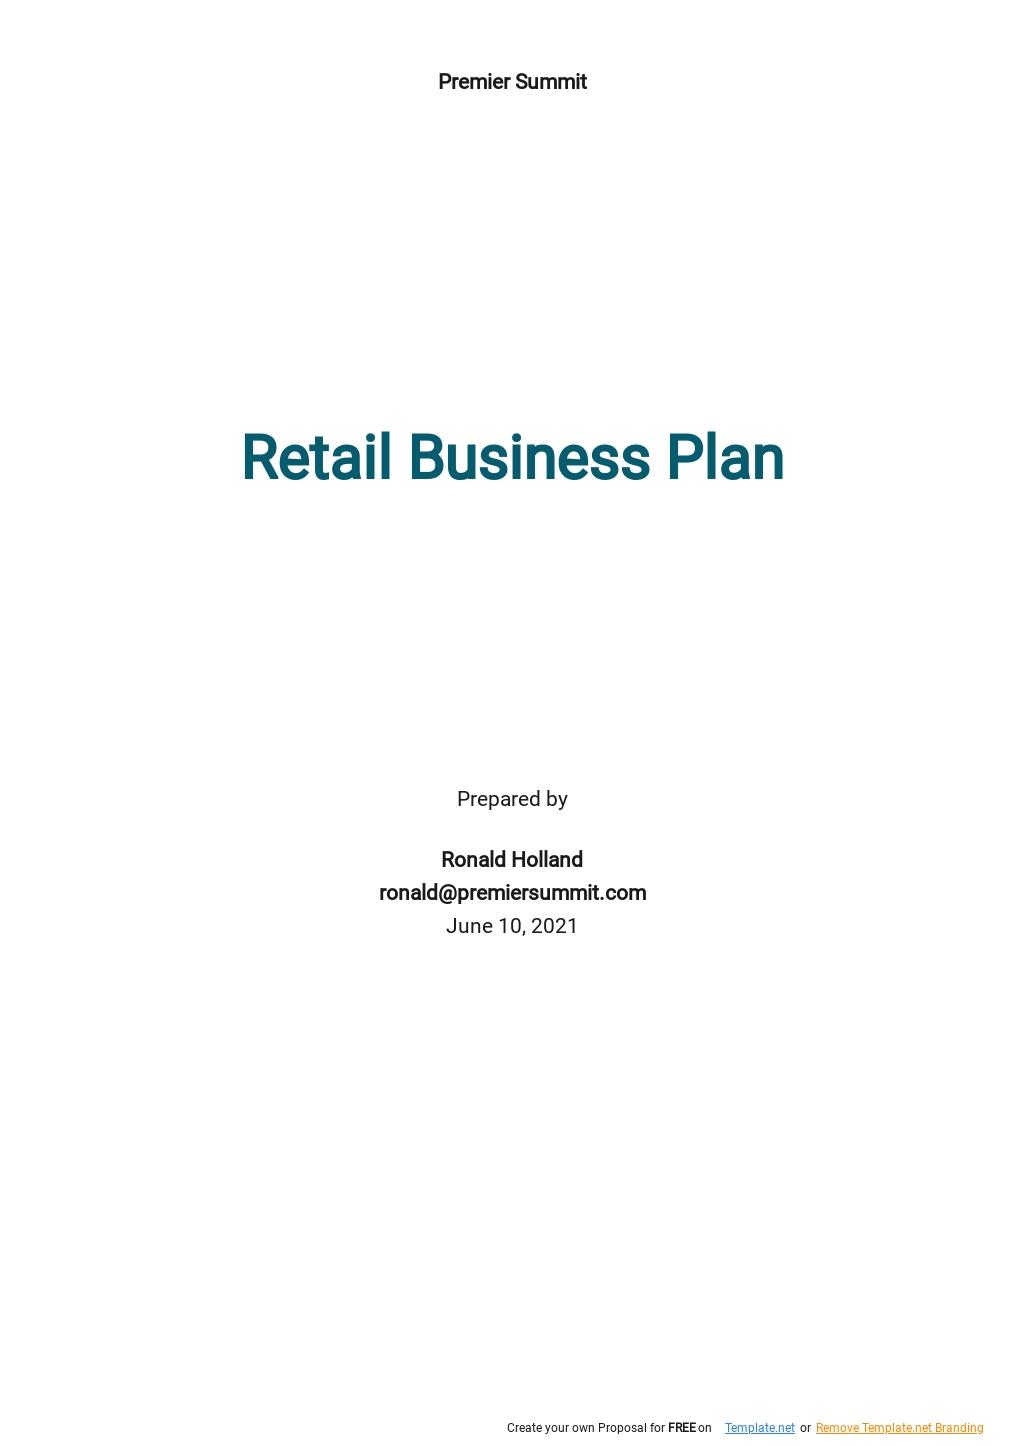 Retail Business Plan Template.jpe